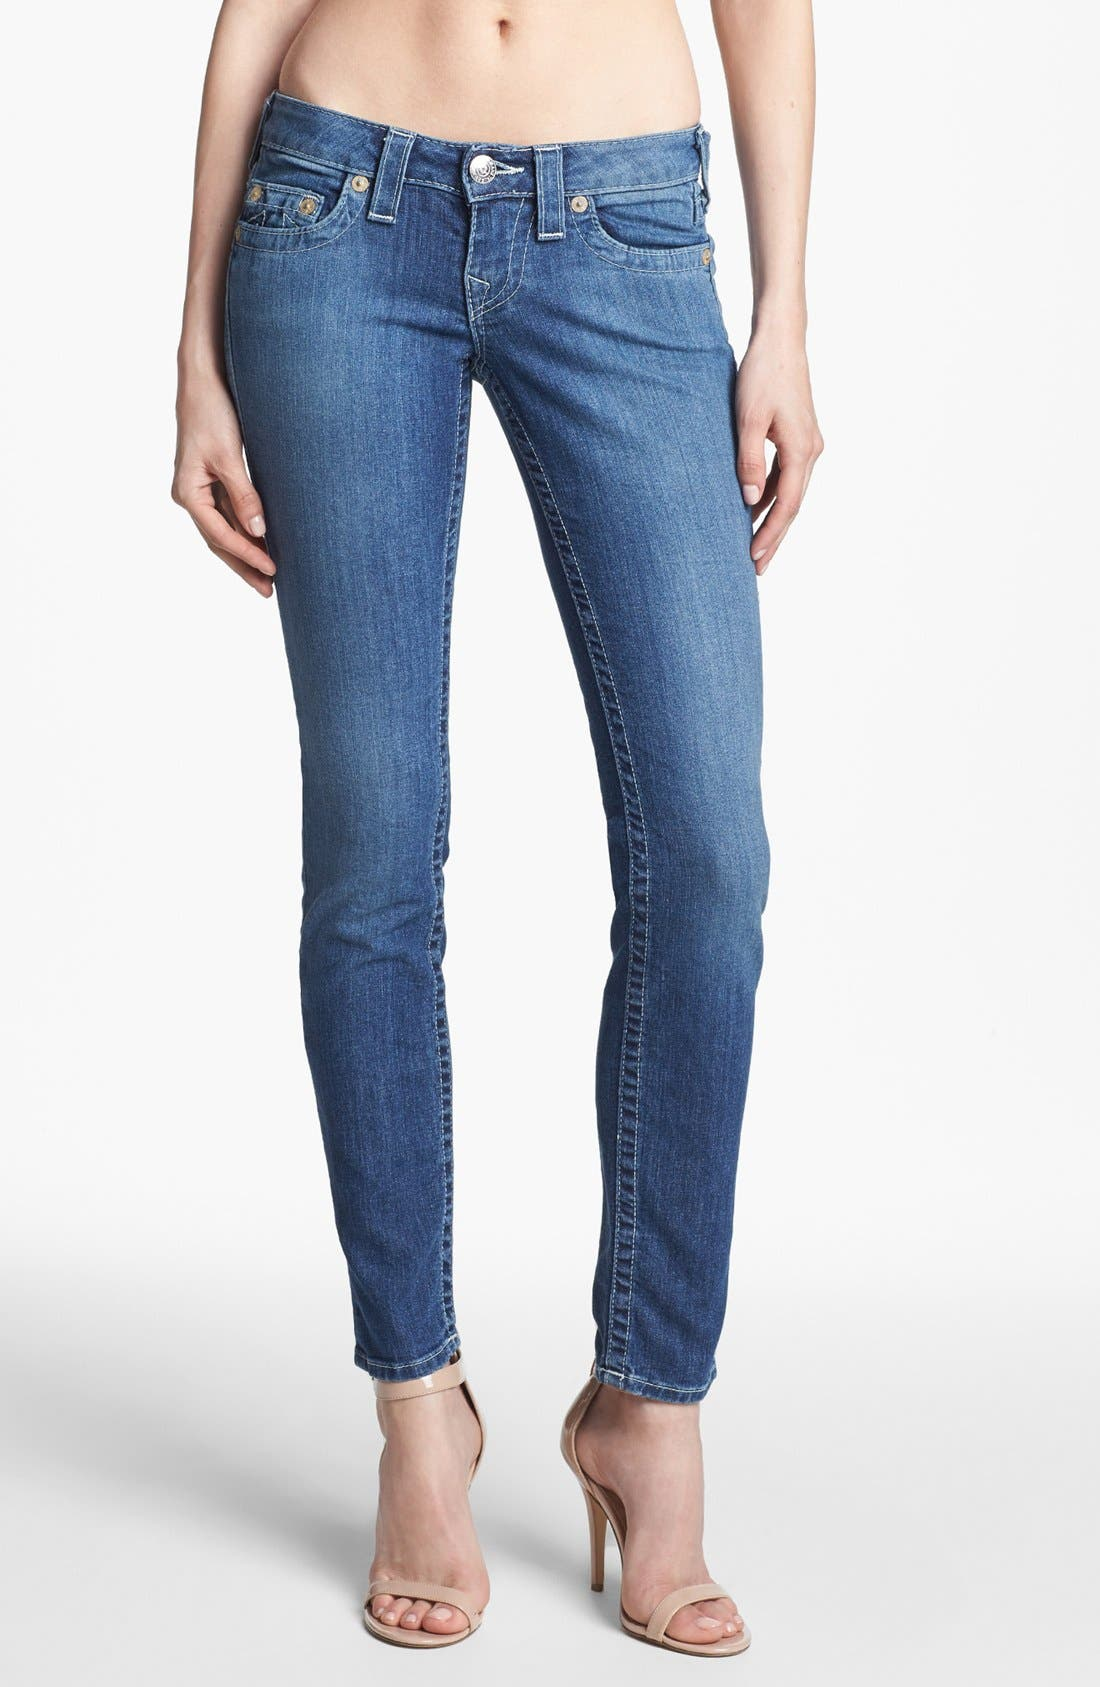 Main Image - True Religion Brand Jeans 'Stella' Skinny Jeans (Cabin Creek)